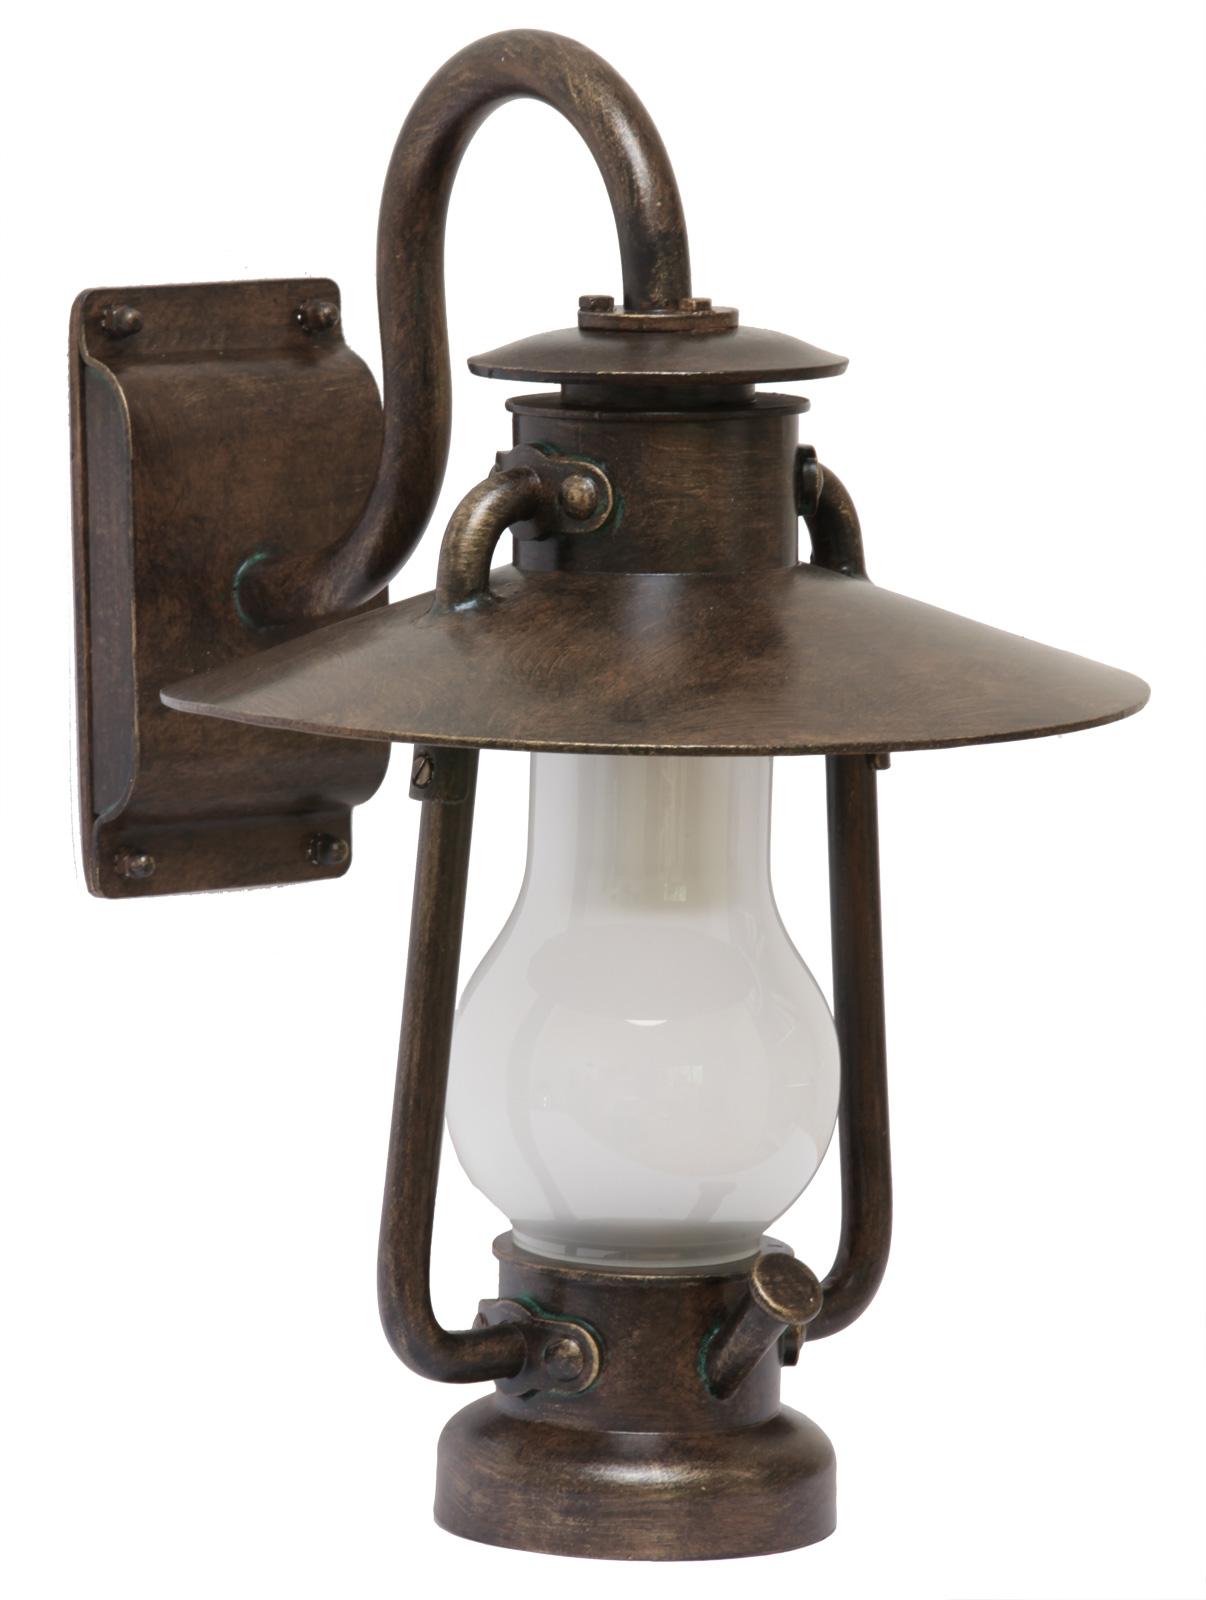 Robers Leuchten german wrought iron barn light wl 3441 terra lumi